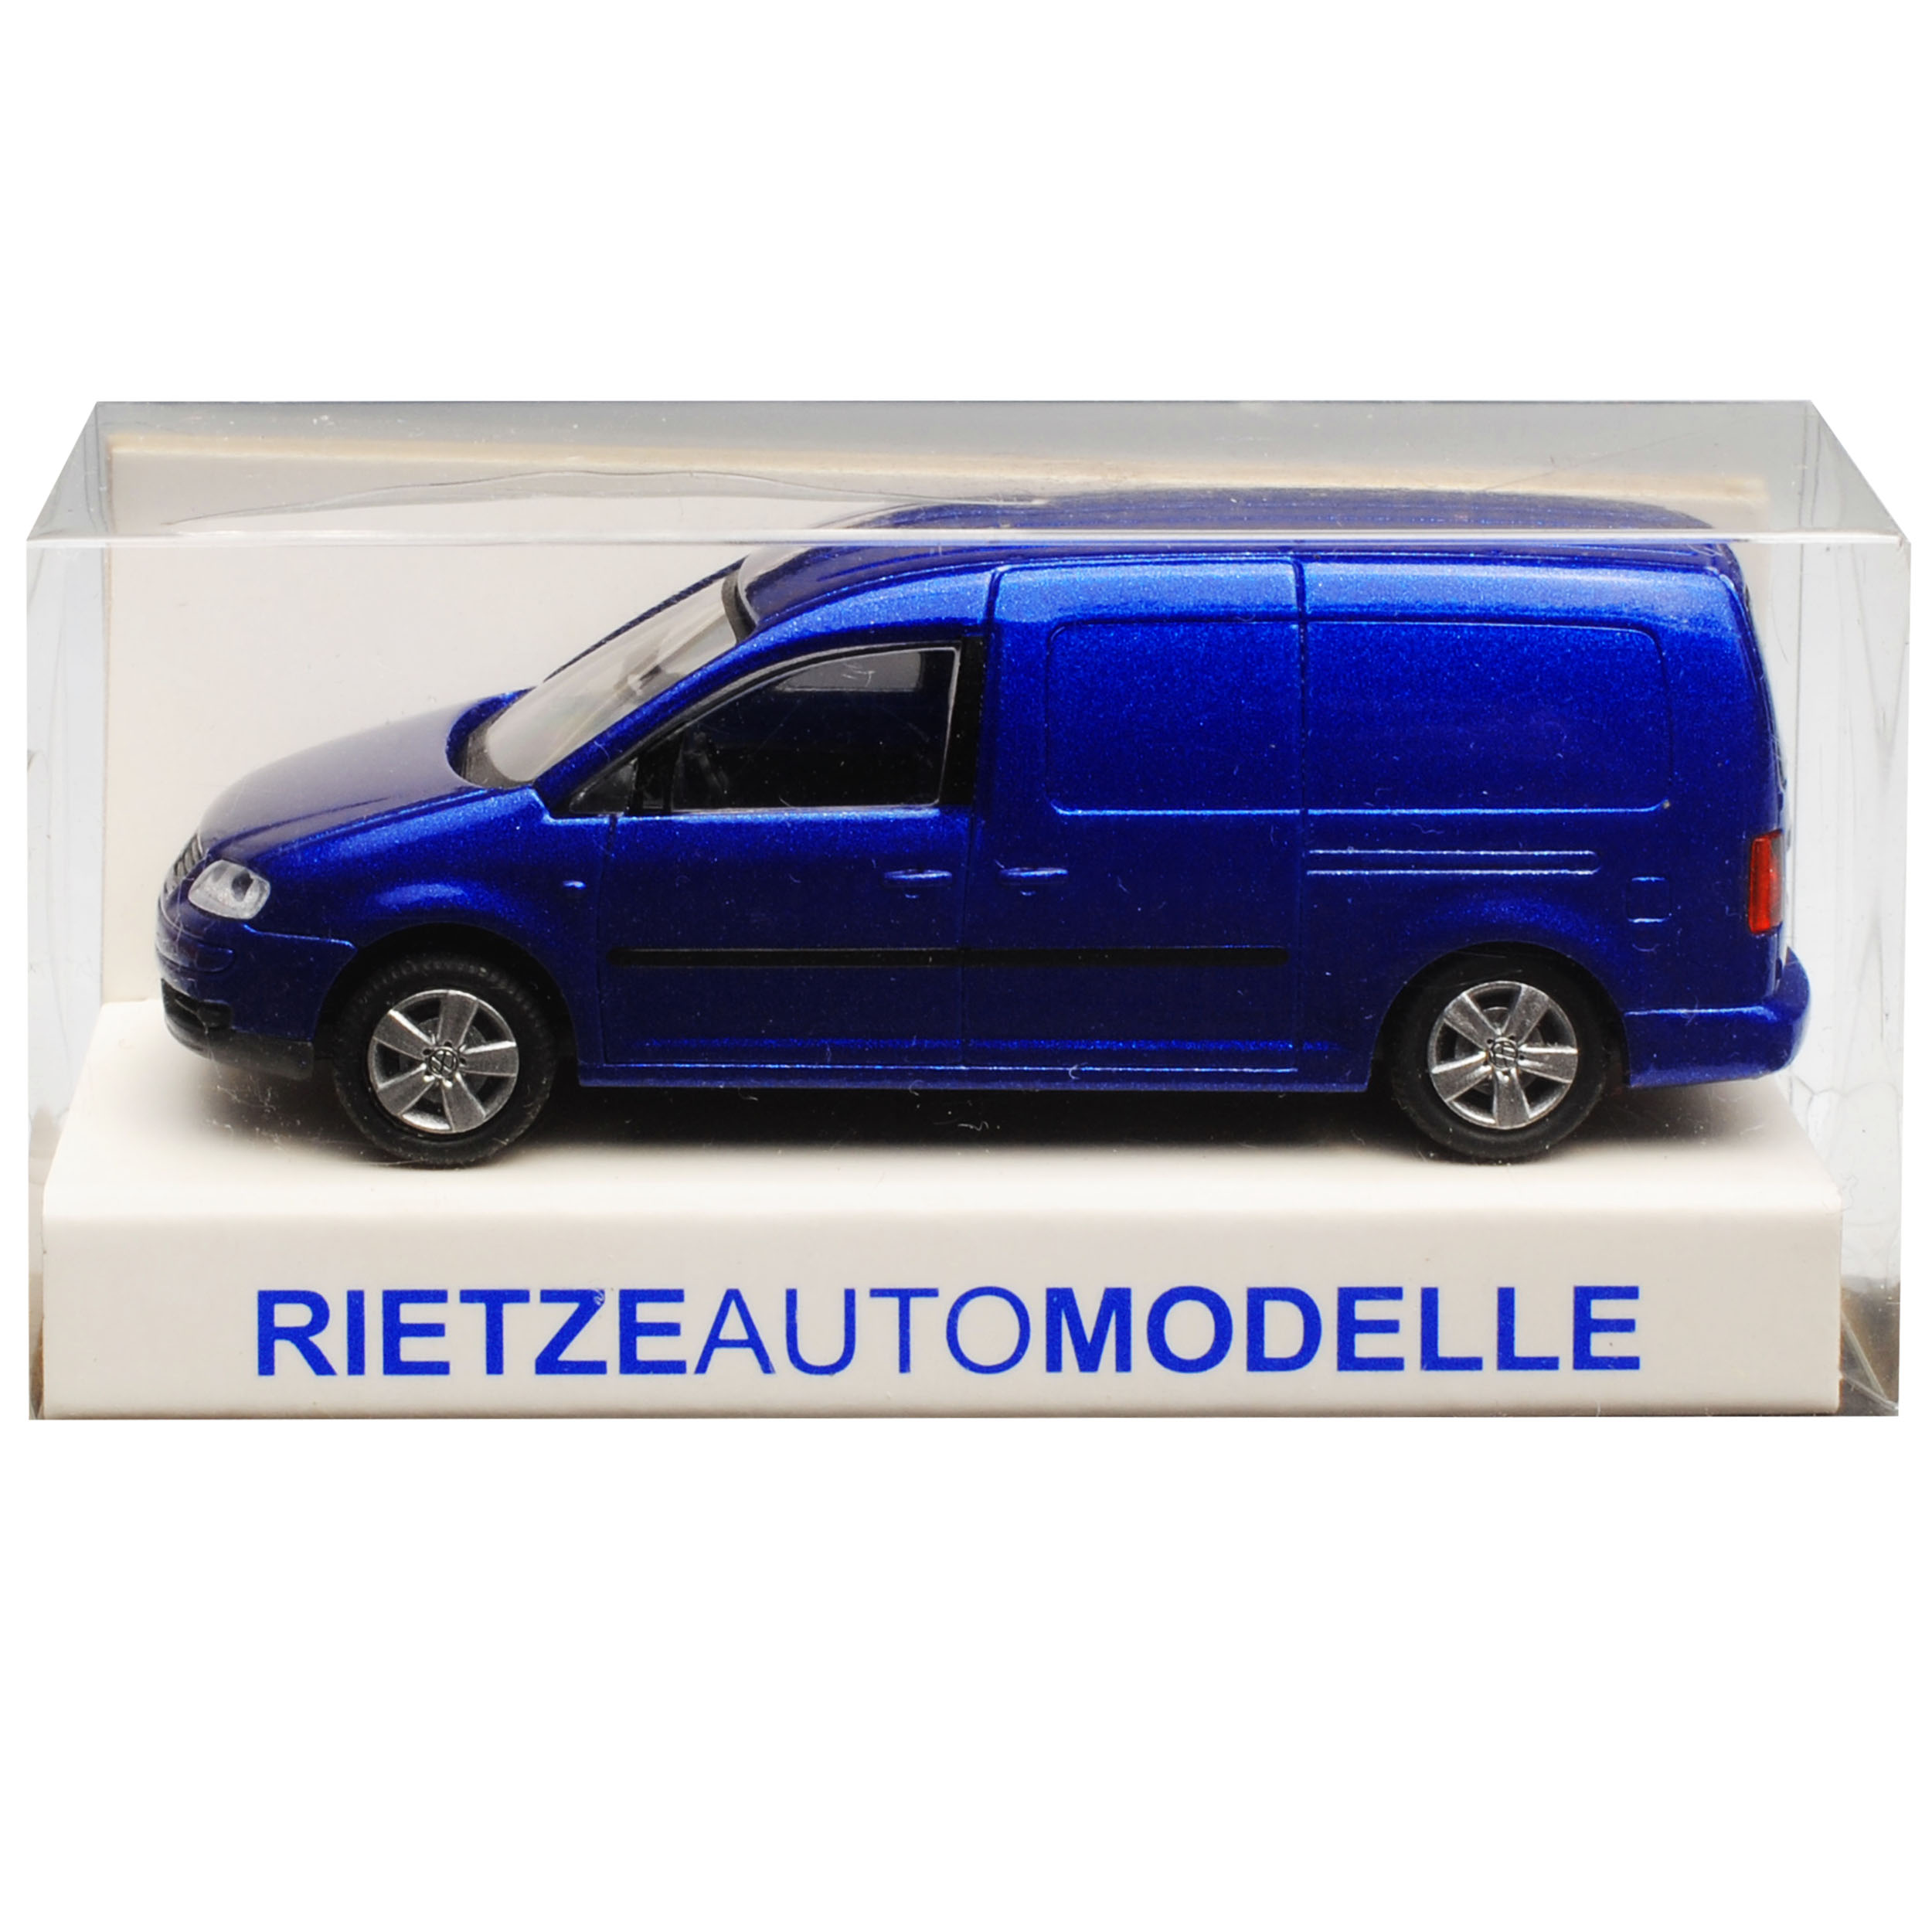 Vw Volkswagen Caddy 2k Maxi Transporter Kasten Blau Metallic